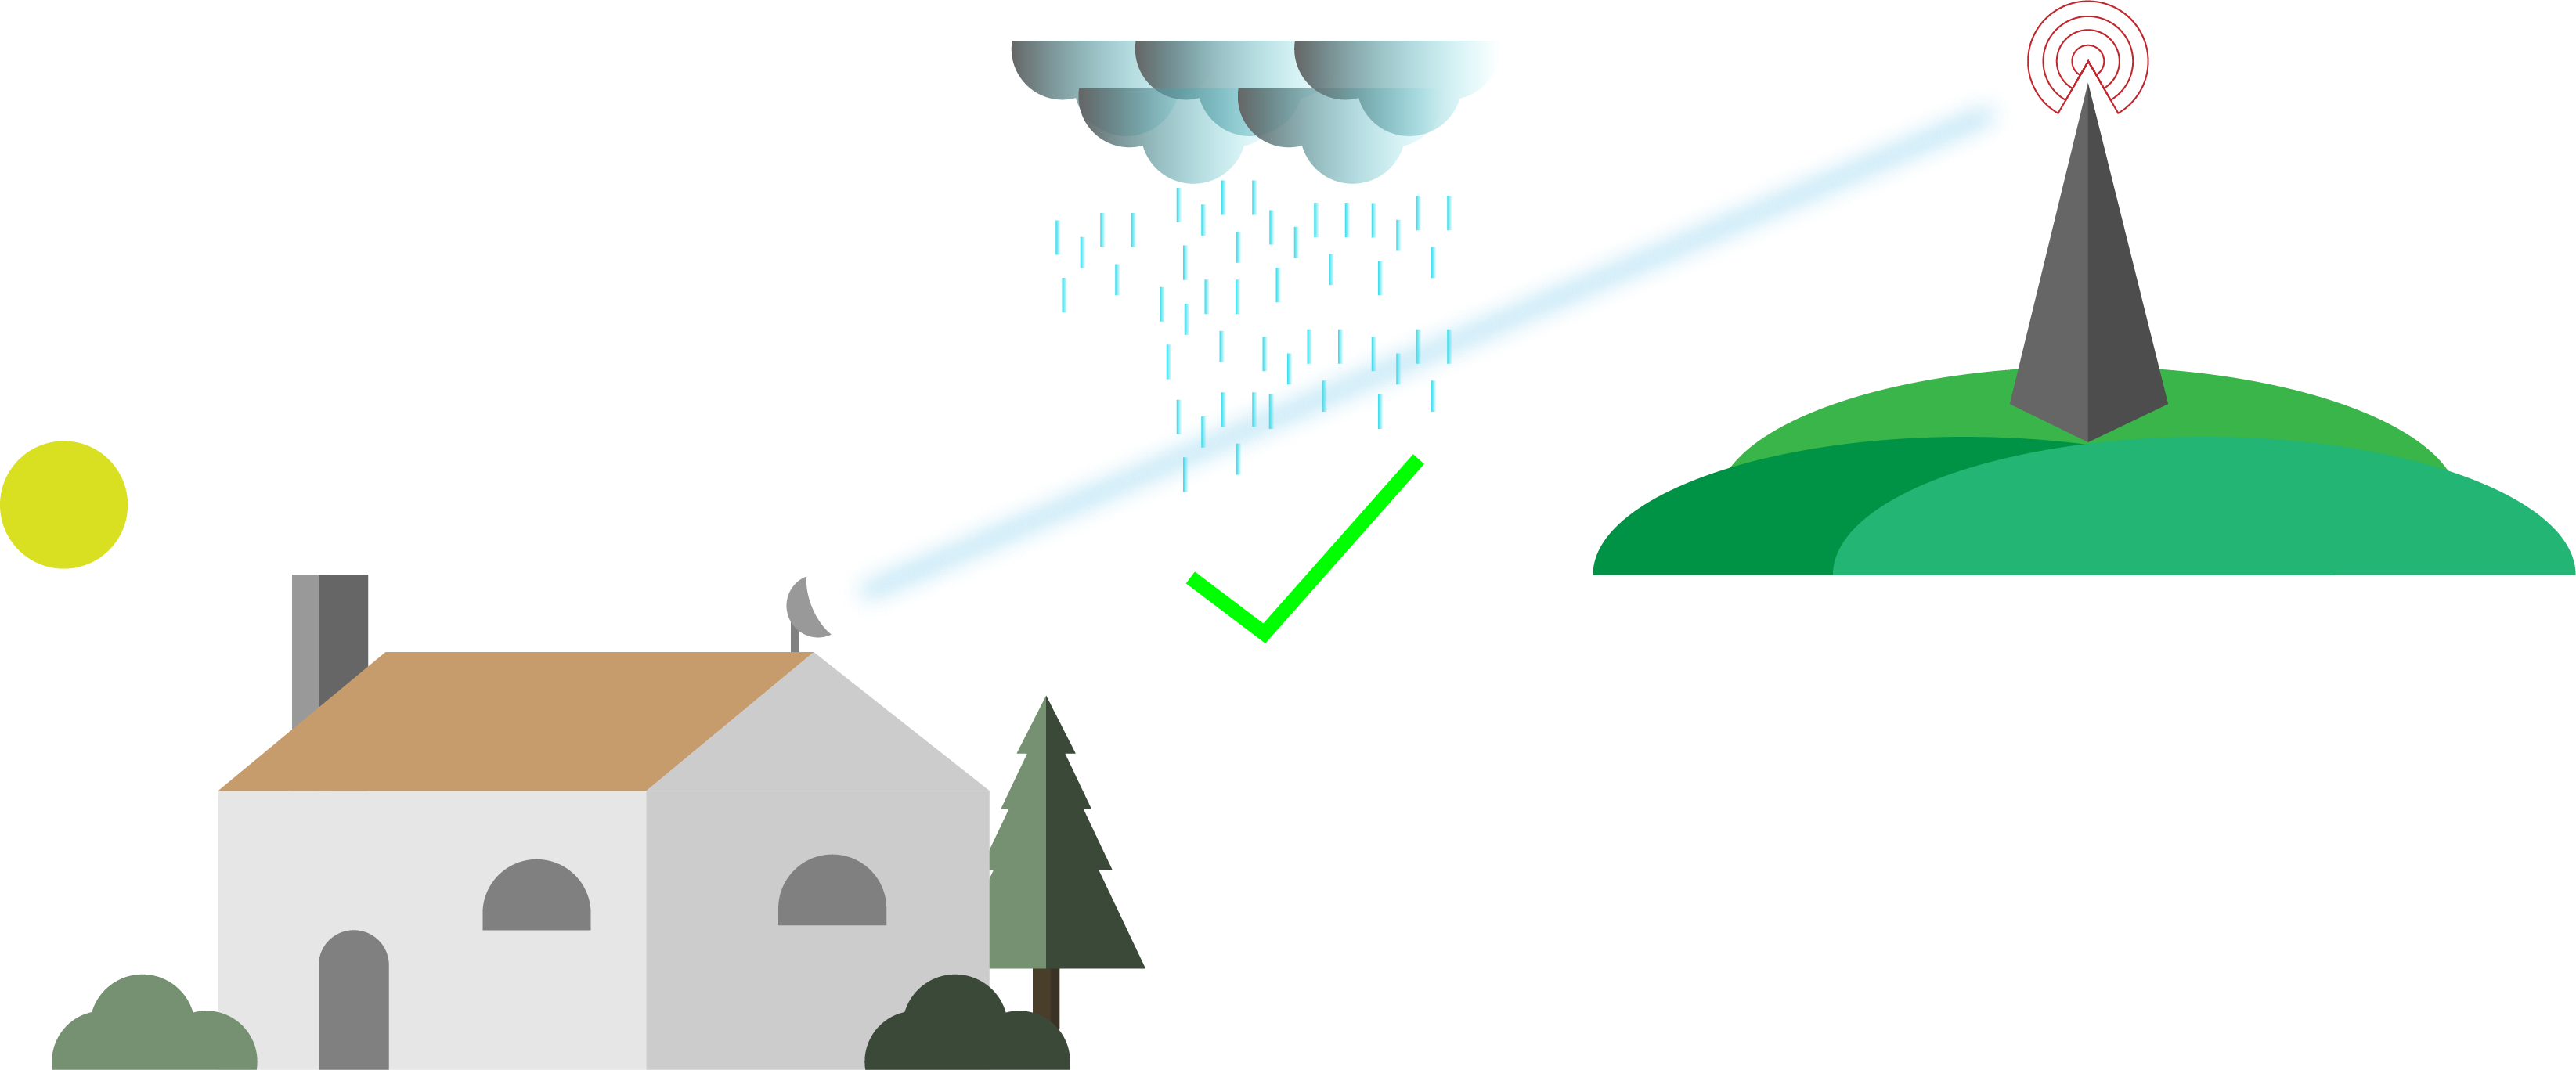 Demonstrating rain not disrupting fixed wireless signal